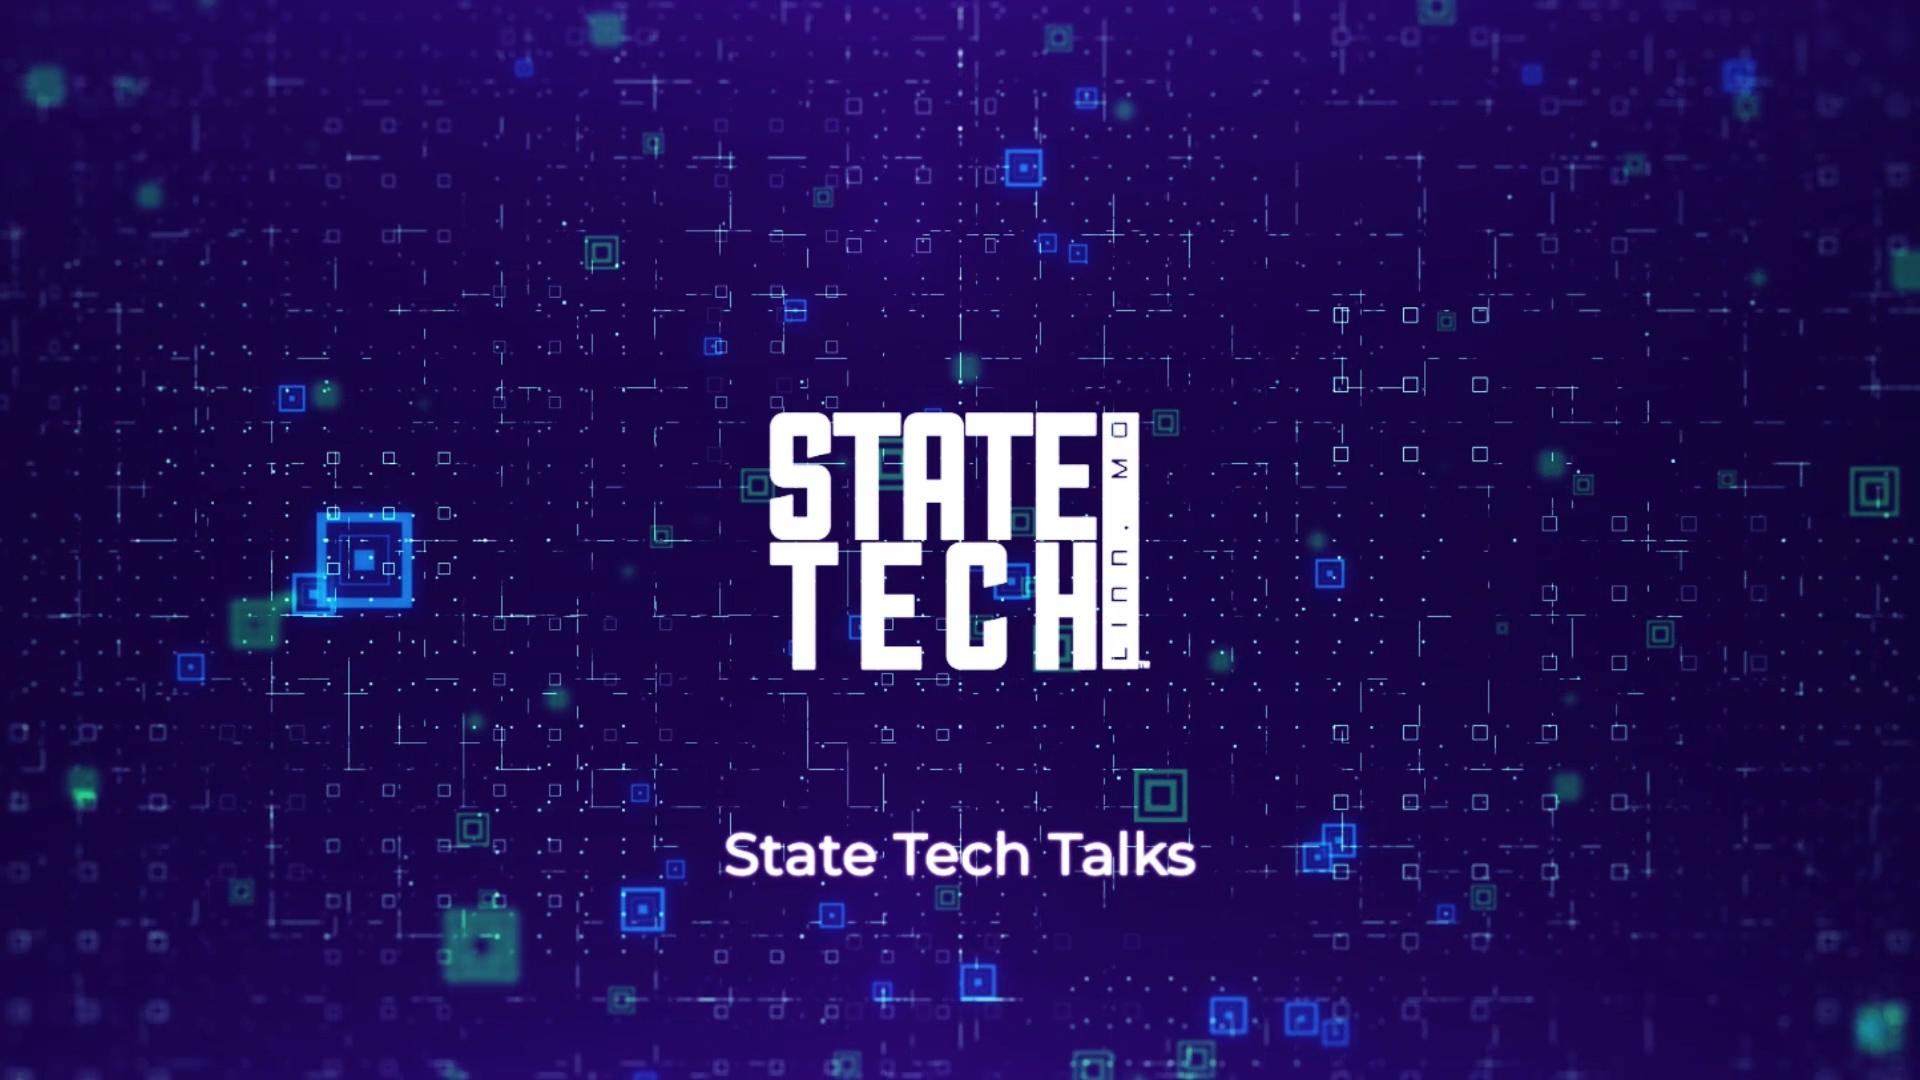 State Tech Talks